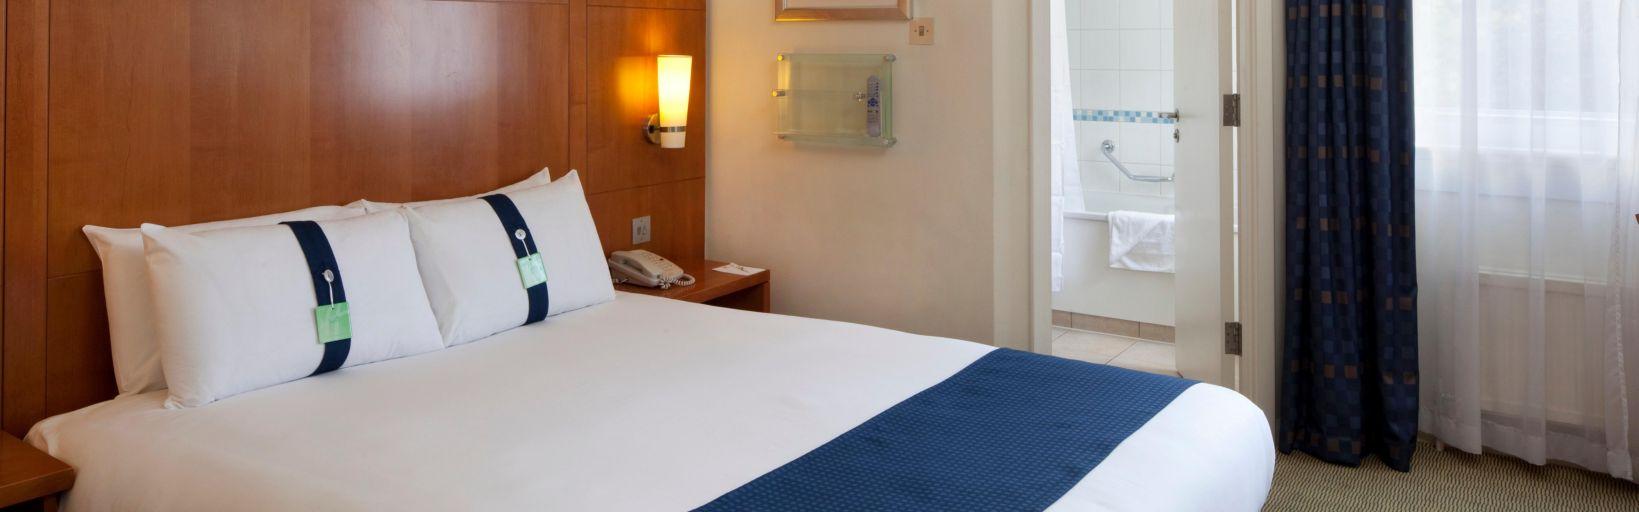 Holiday Inn Basingstoke Hotel by IHG